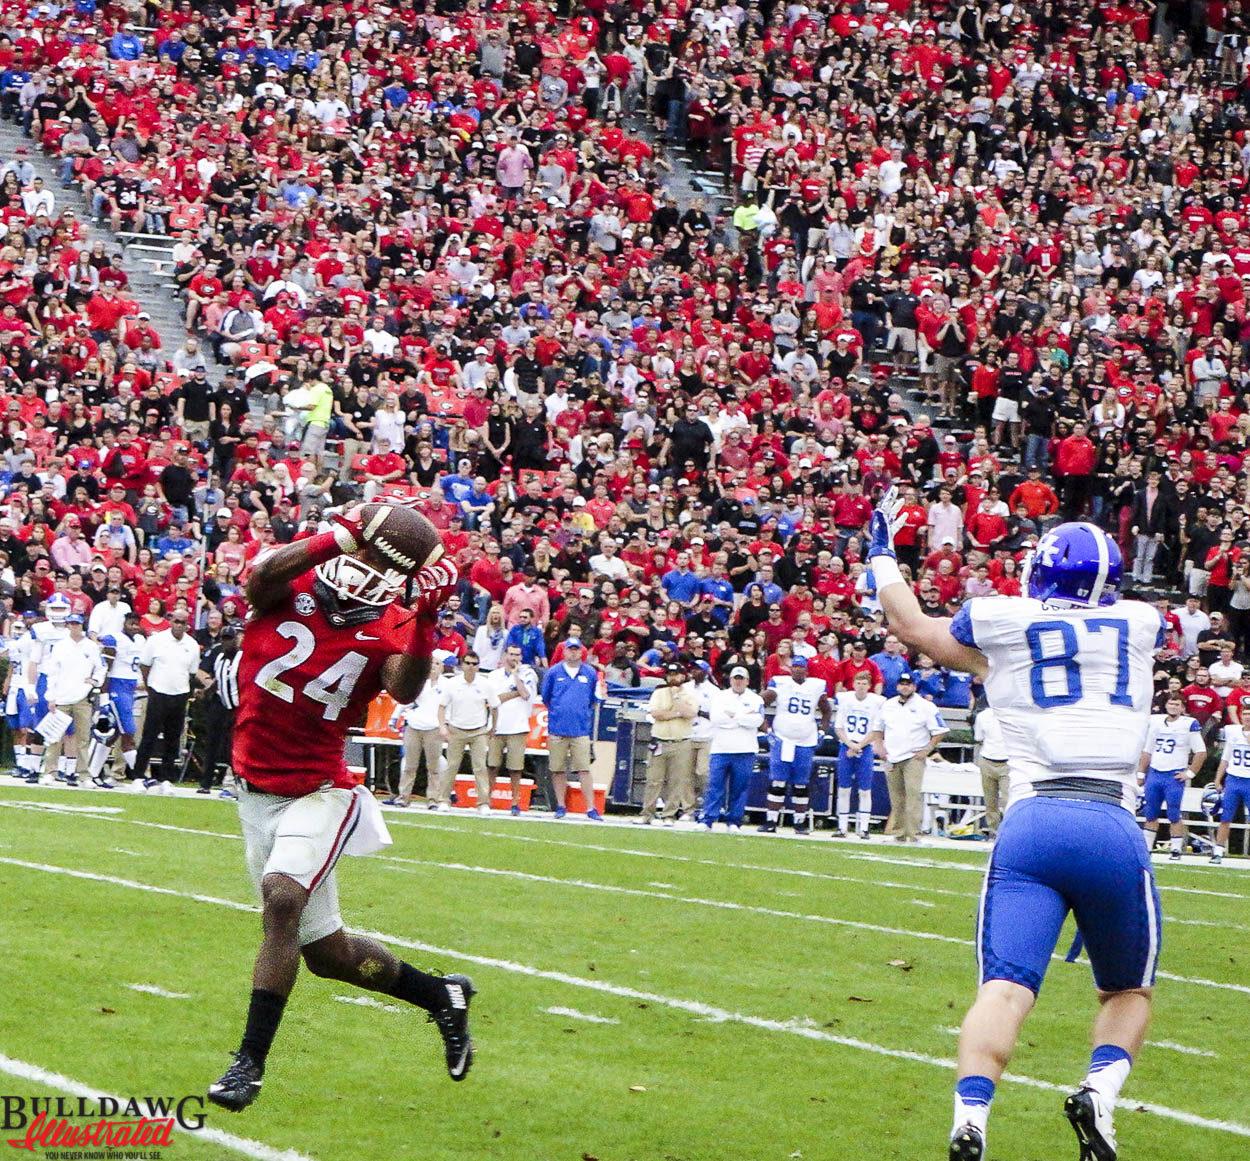 Dominick Sanders grabs an interception vs. Kentucky 2015